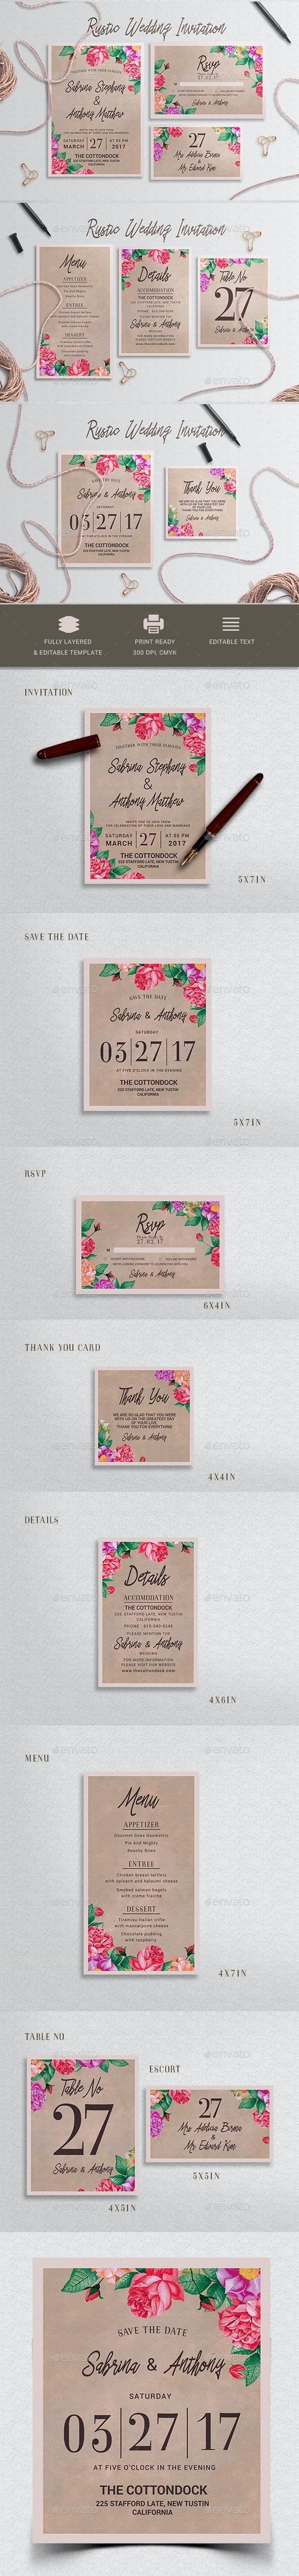 Rustic Wedding Invitation Set - Weddings Cards & Invites